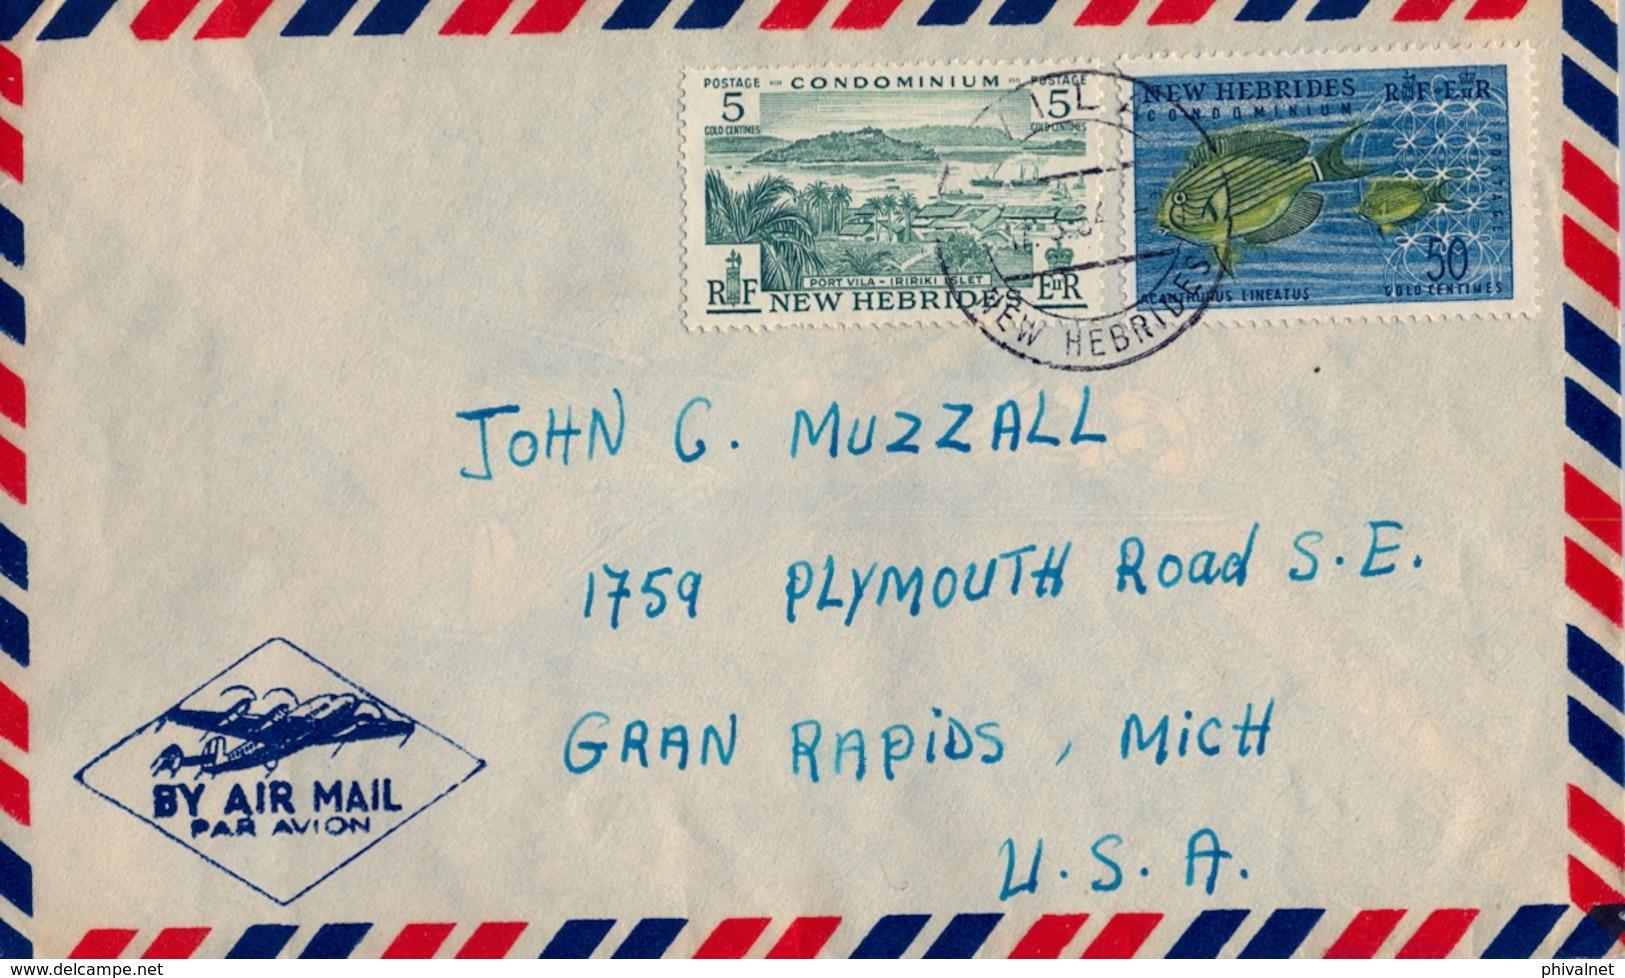 1964 NOUVELLES HEBRIDES / NEW HEBRIDES , SOBRE CIRCULADO PORT VILA - MICHIGAN , CORREO AÉREO, ACANTHUNUS , IRIRIKI ISLET - Cartas